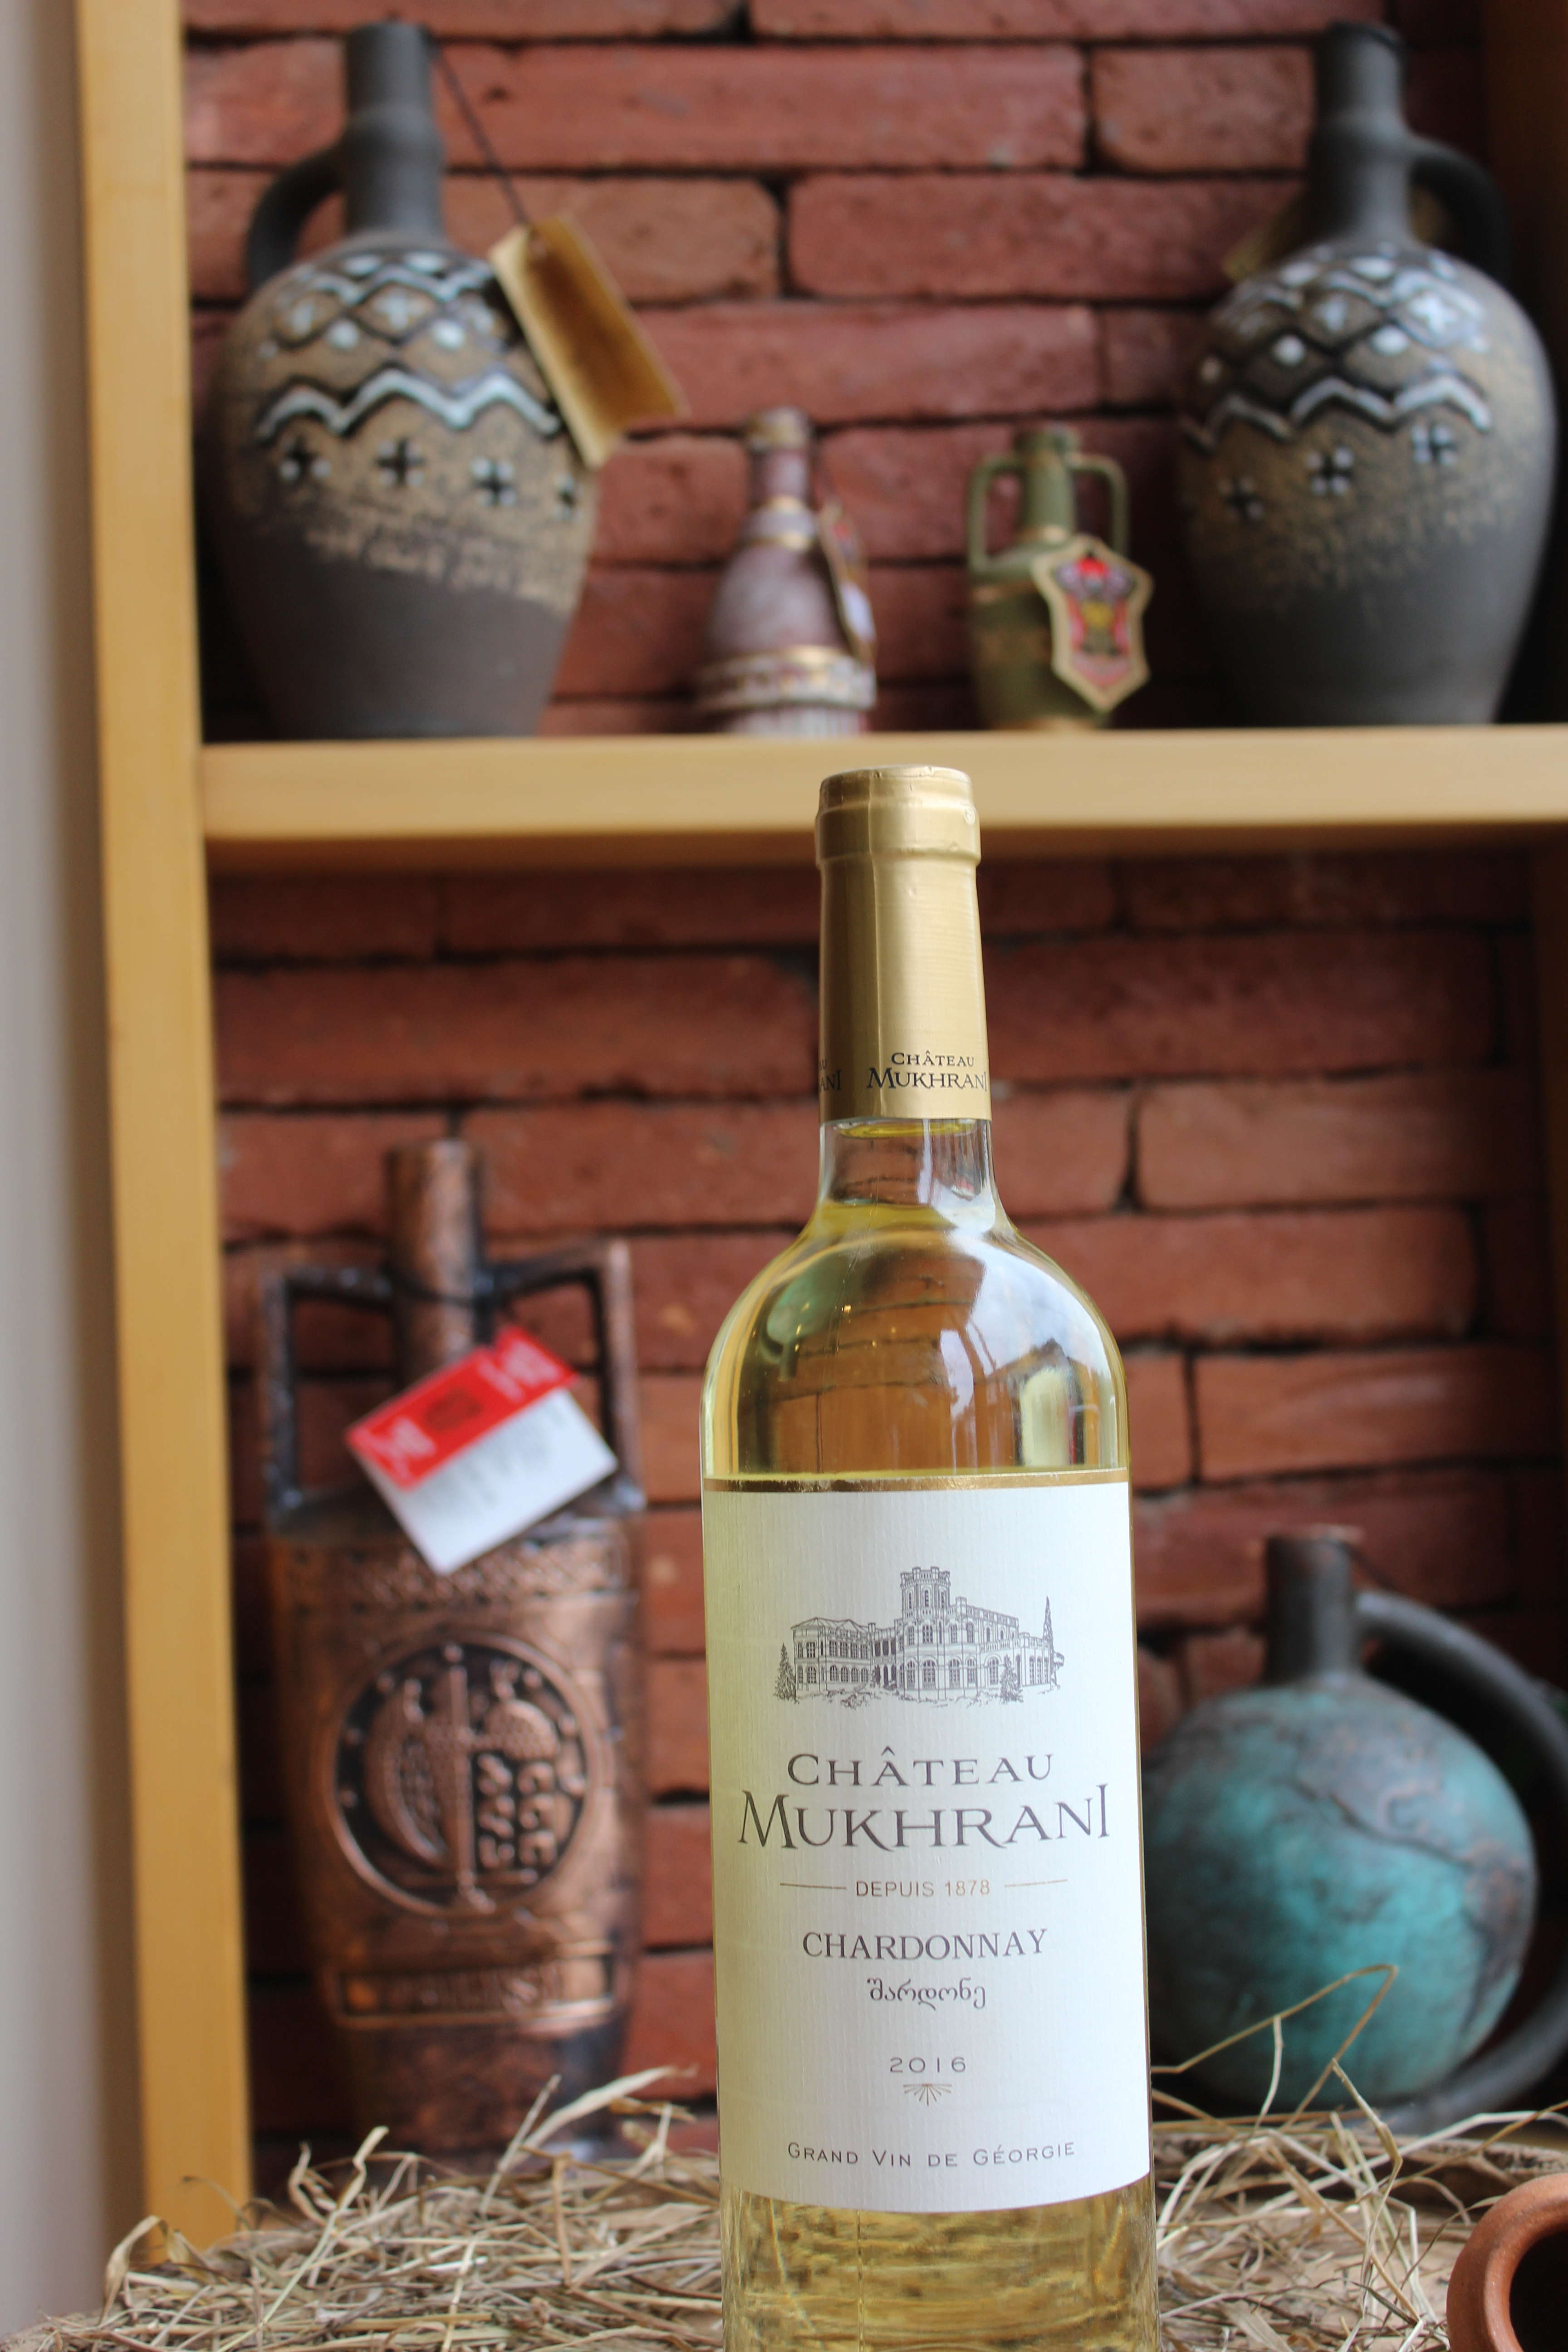 Château Mukhrani - Chardonnay